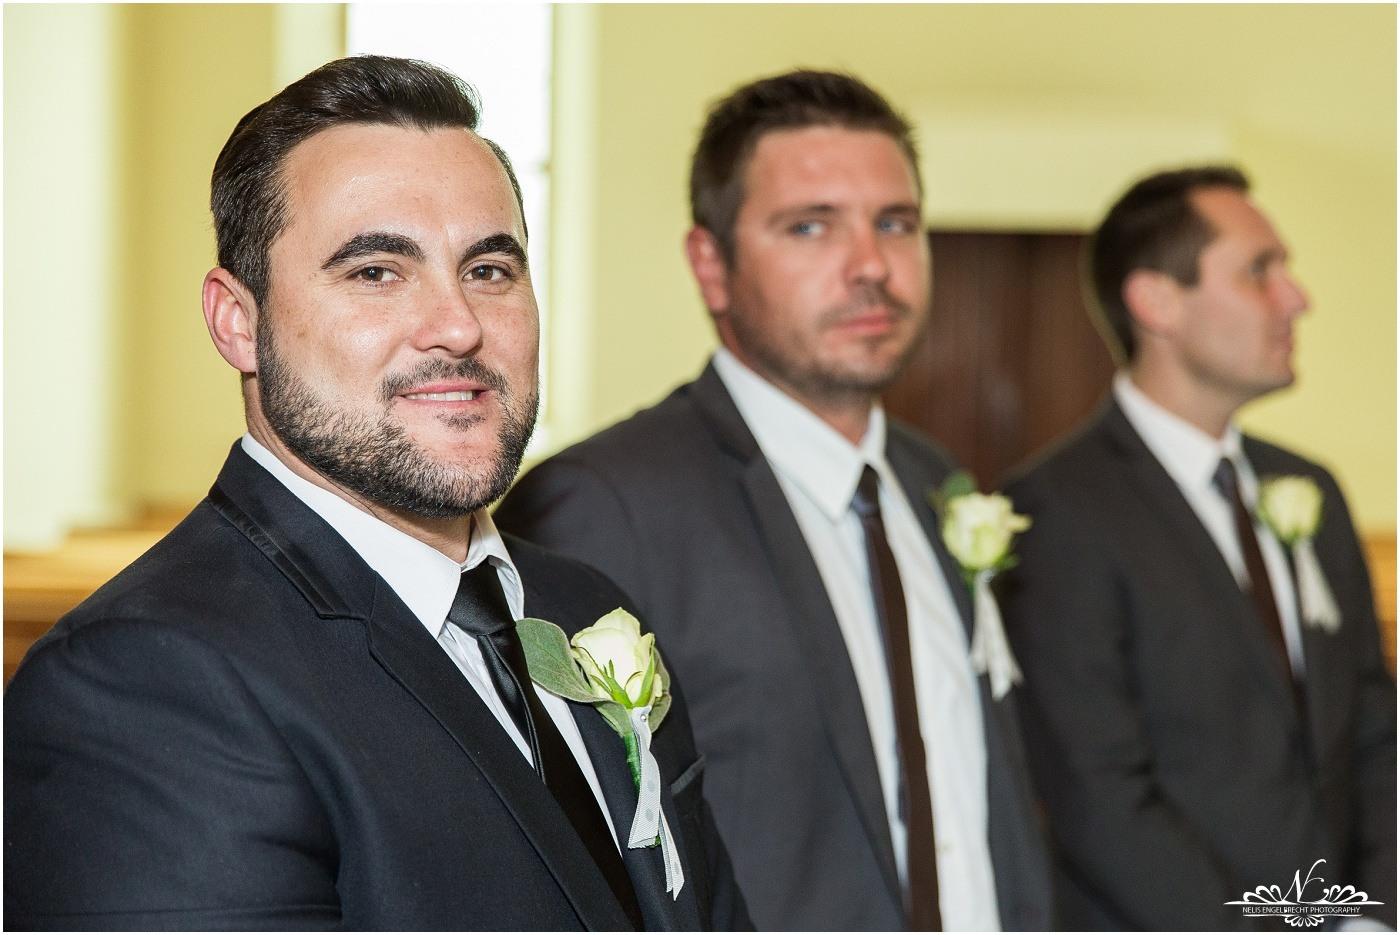 Eensgezind-Wedding-Photos-Nelis-Engelbrecht-Photography-054